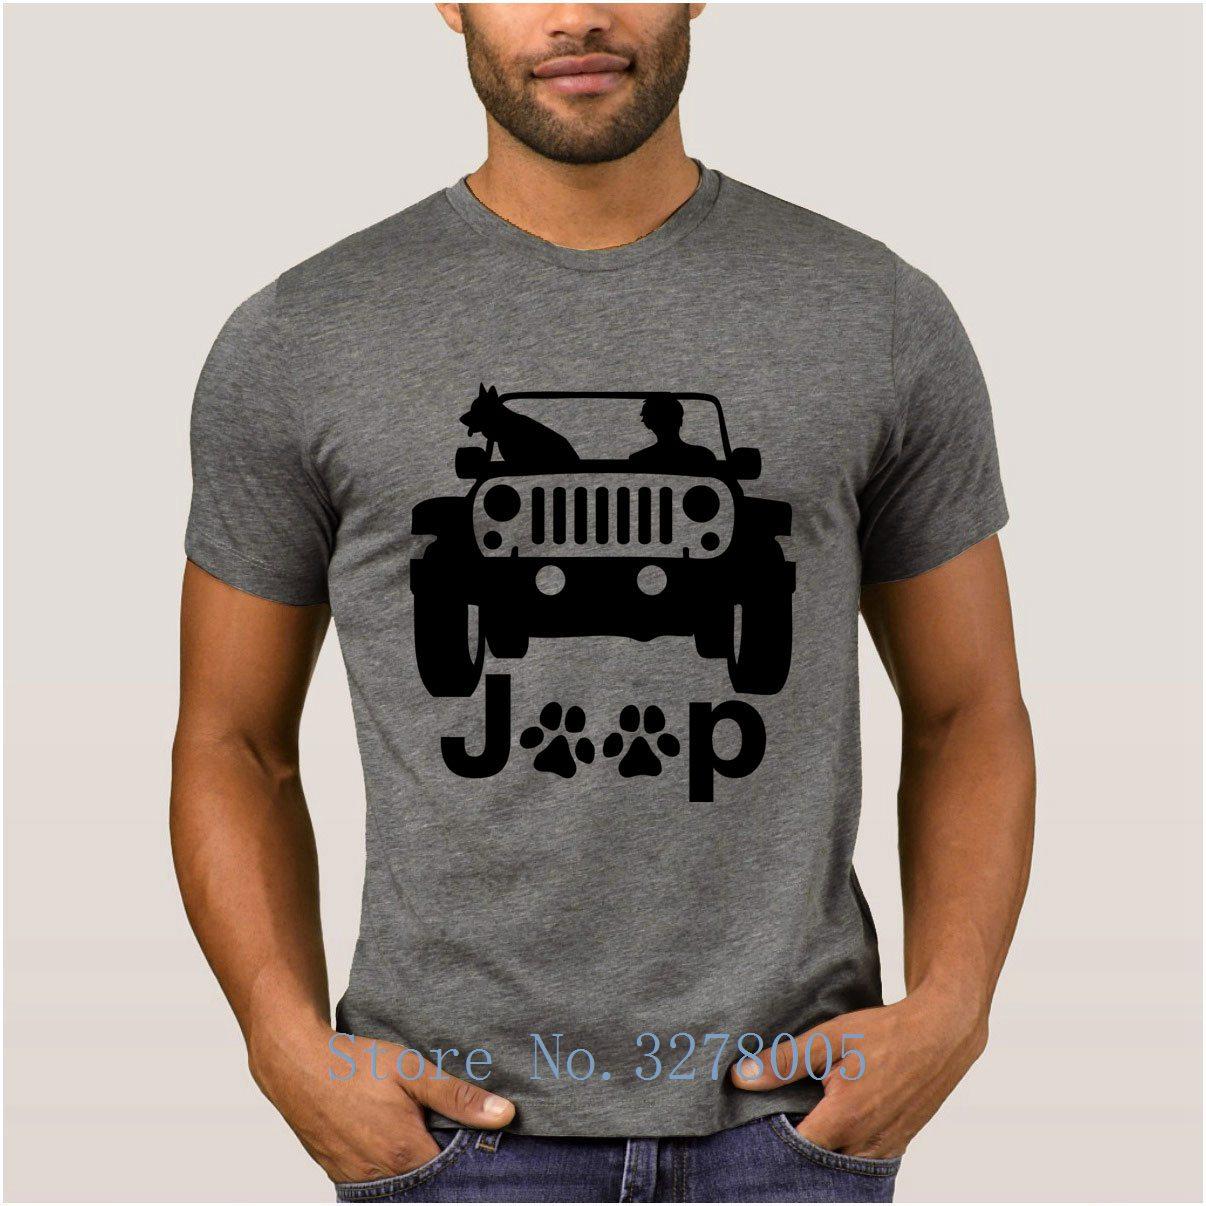 Brand La Maxpa Humor Jeep Canine And Dog   T     Shirt   2018 Regular   T  -  Shirt   For Men Streetwear Crew Neck Men's Tshirt Cheap Sale